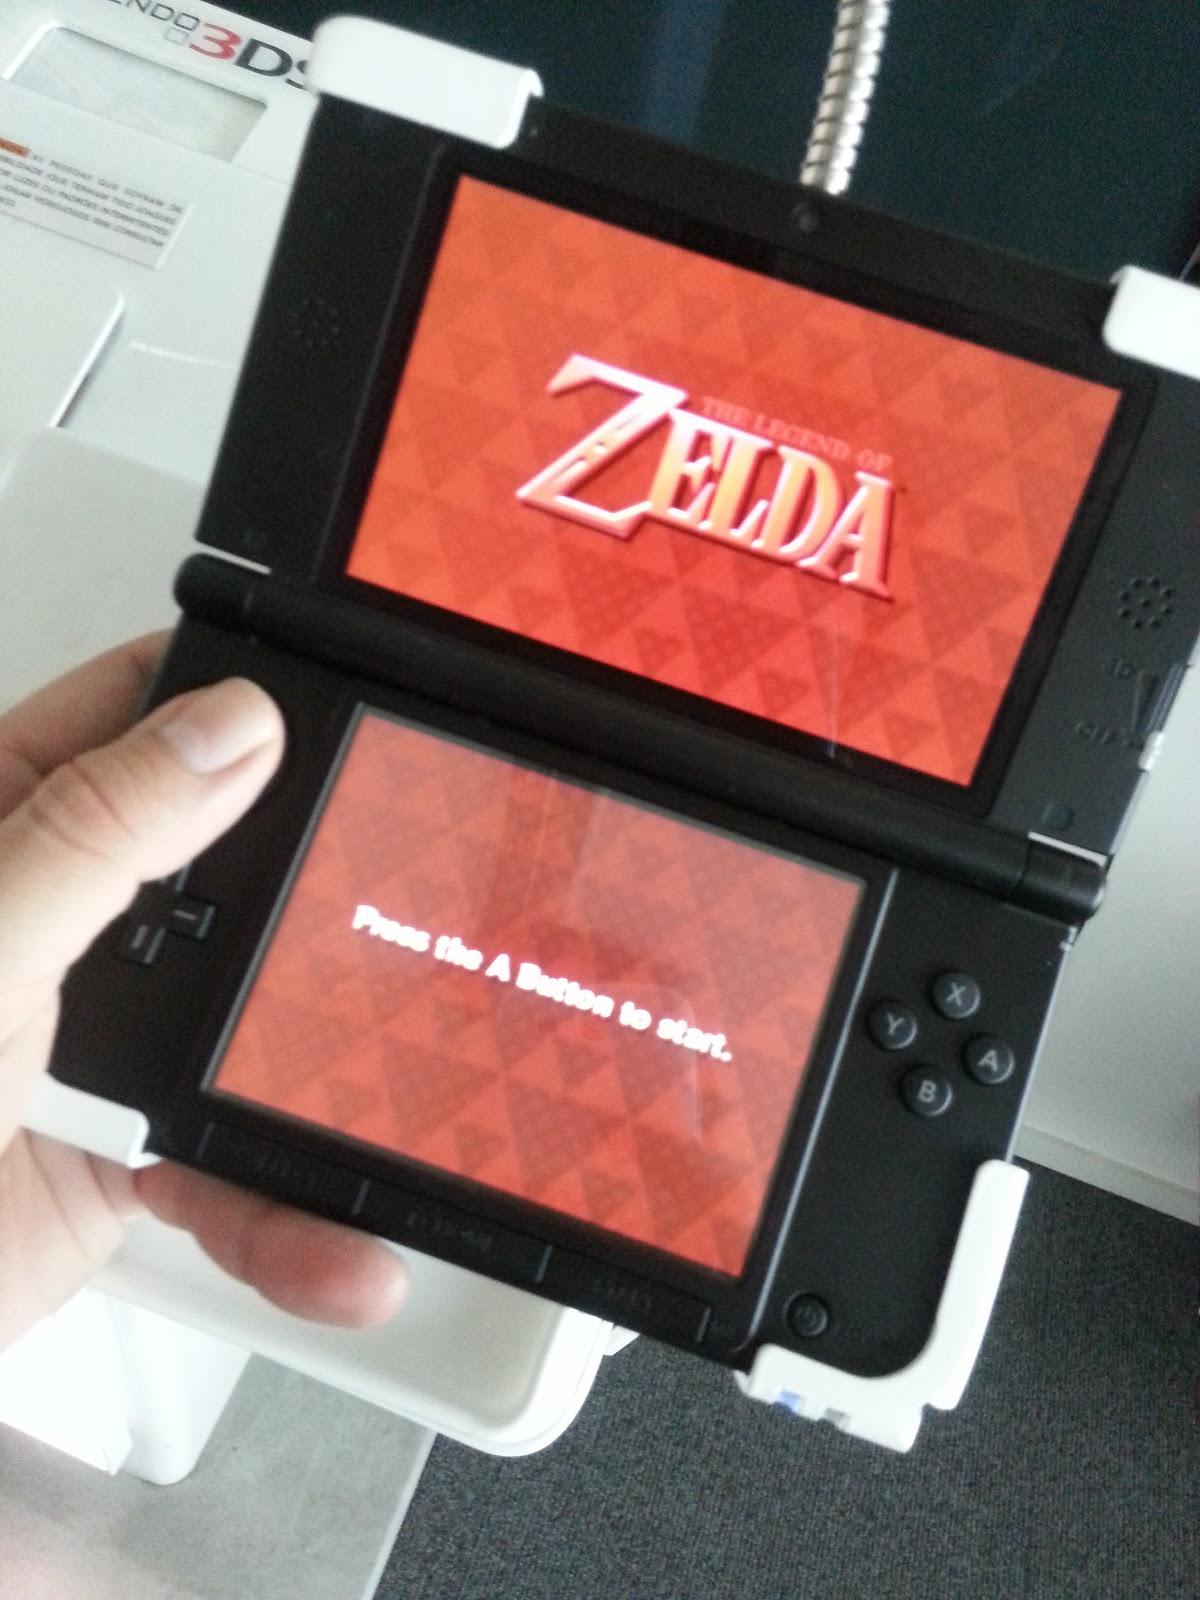 console zelda 3ds